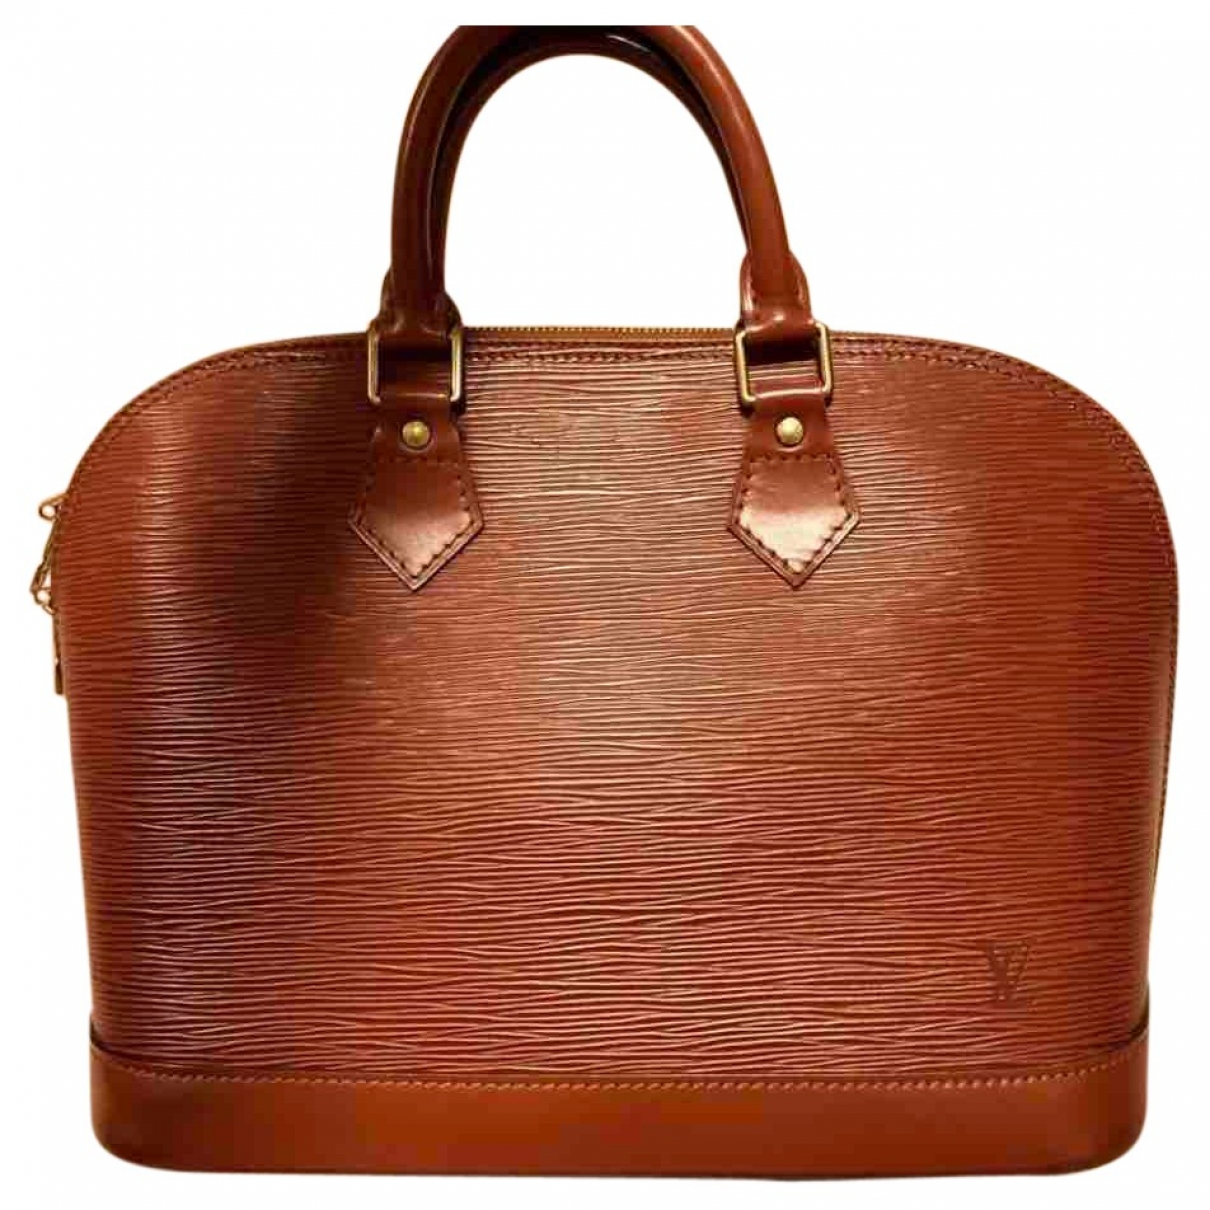 Louis Vuitton Alma Brown Leather handbag for Women \N